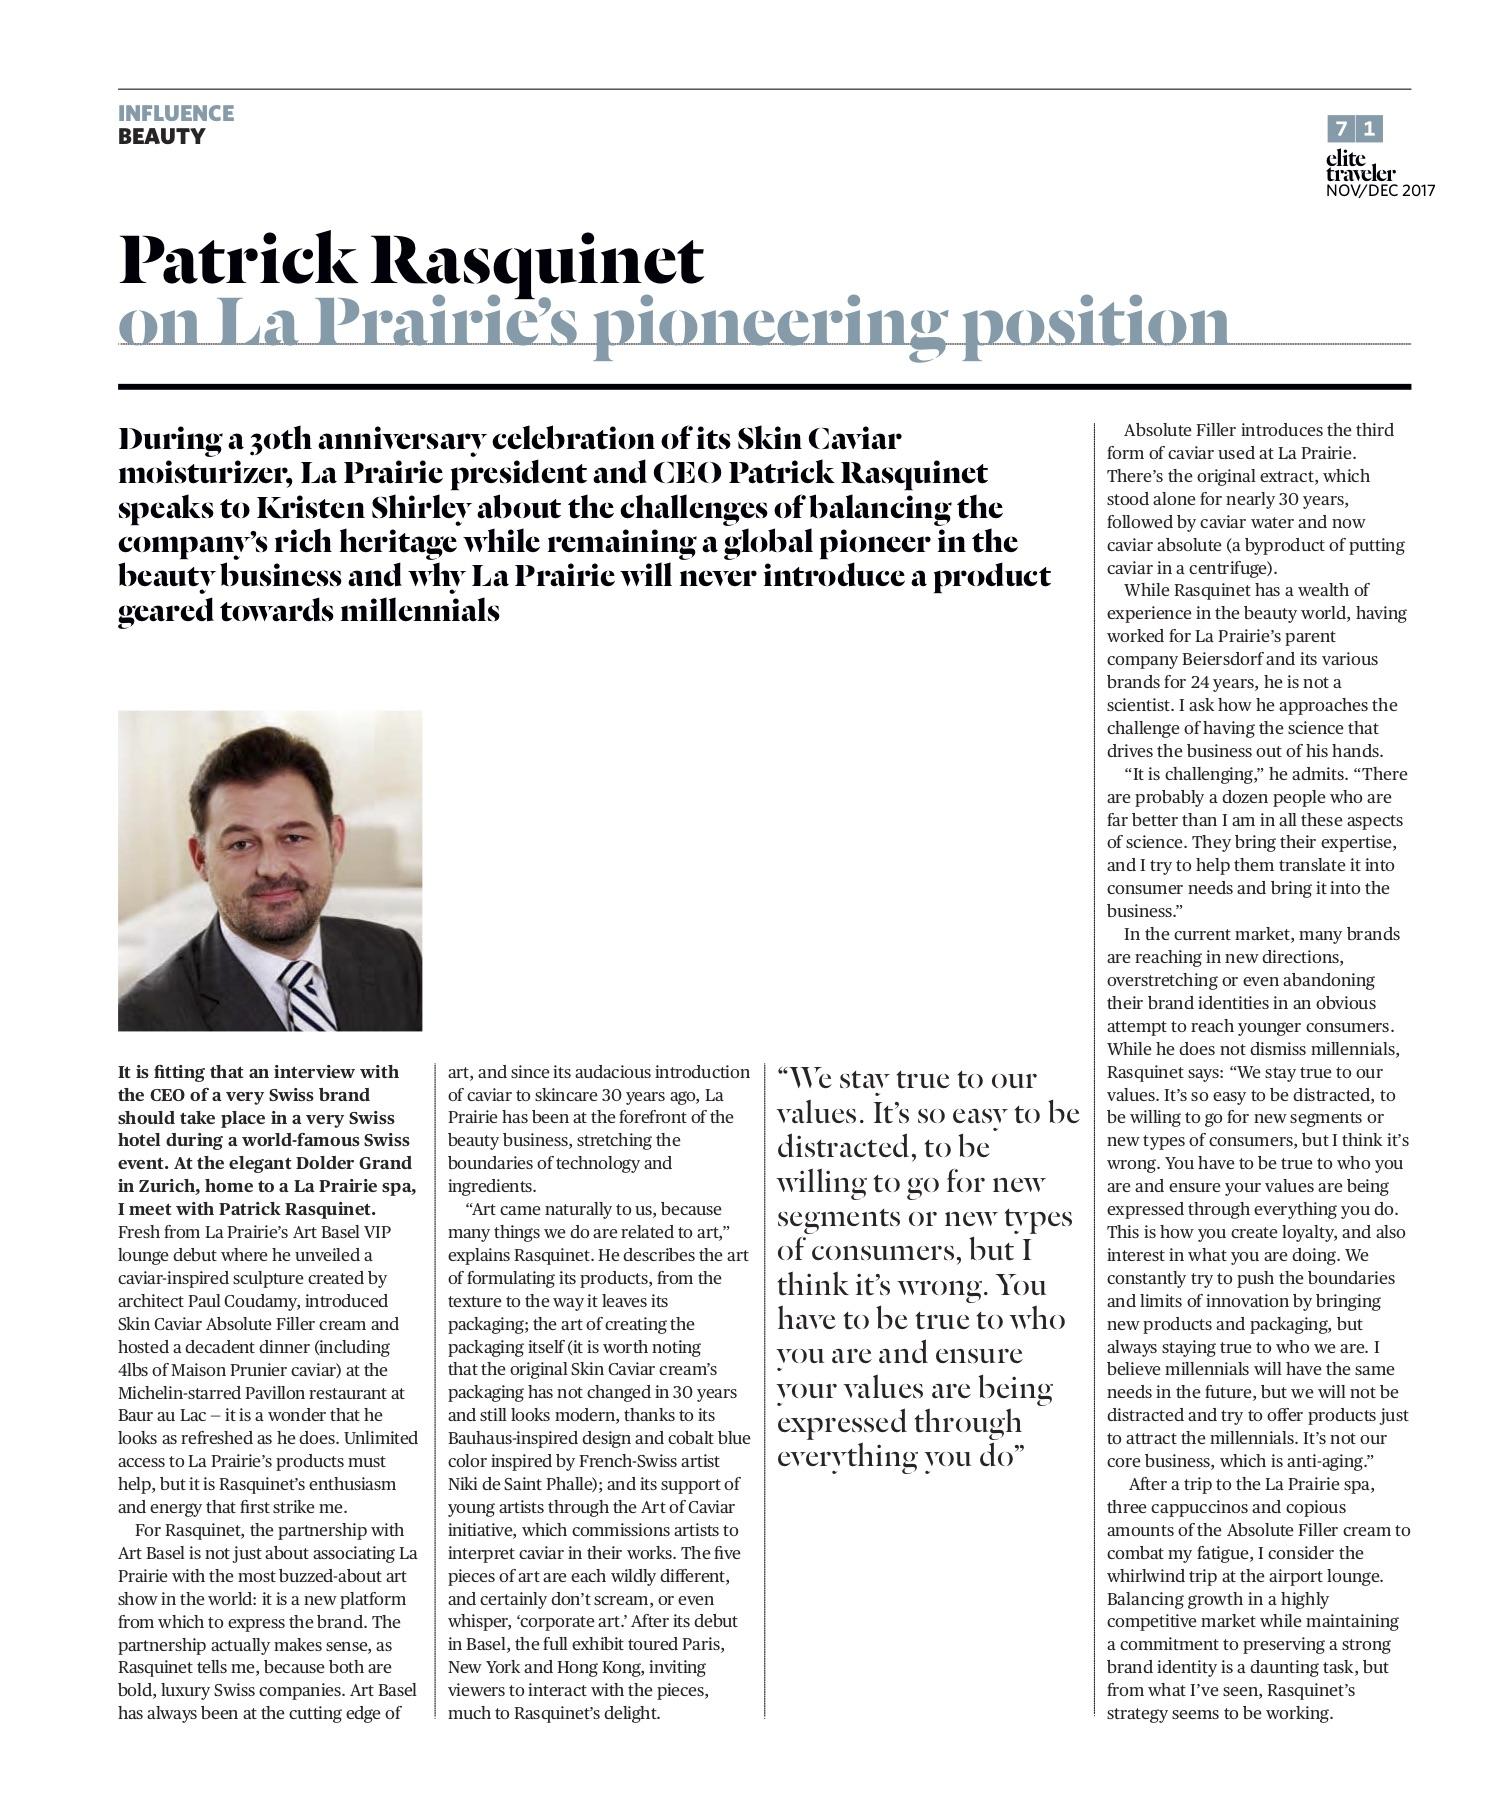 Patrick Rasquinet, CEO of La Prairie